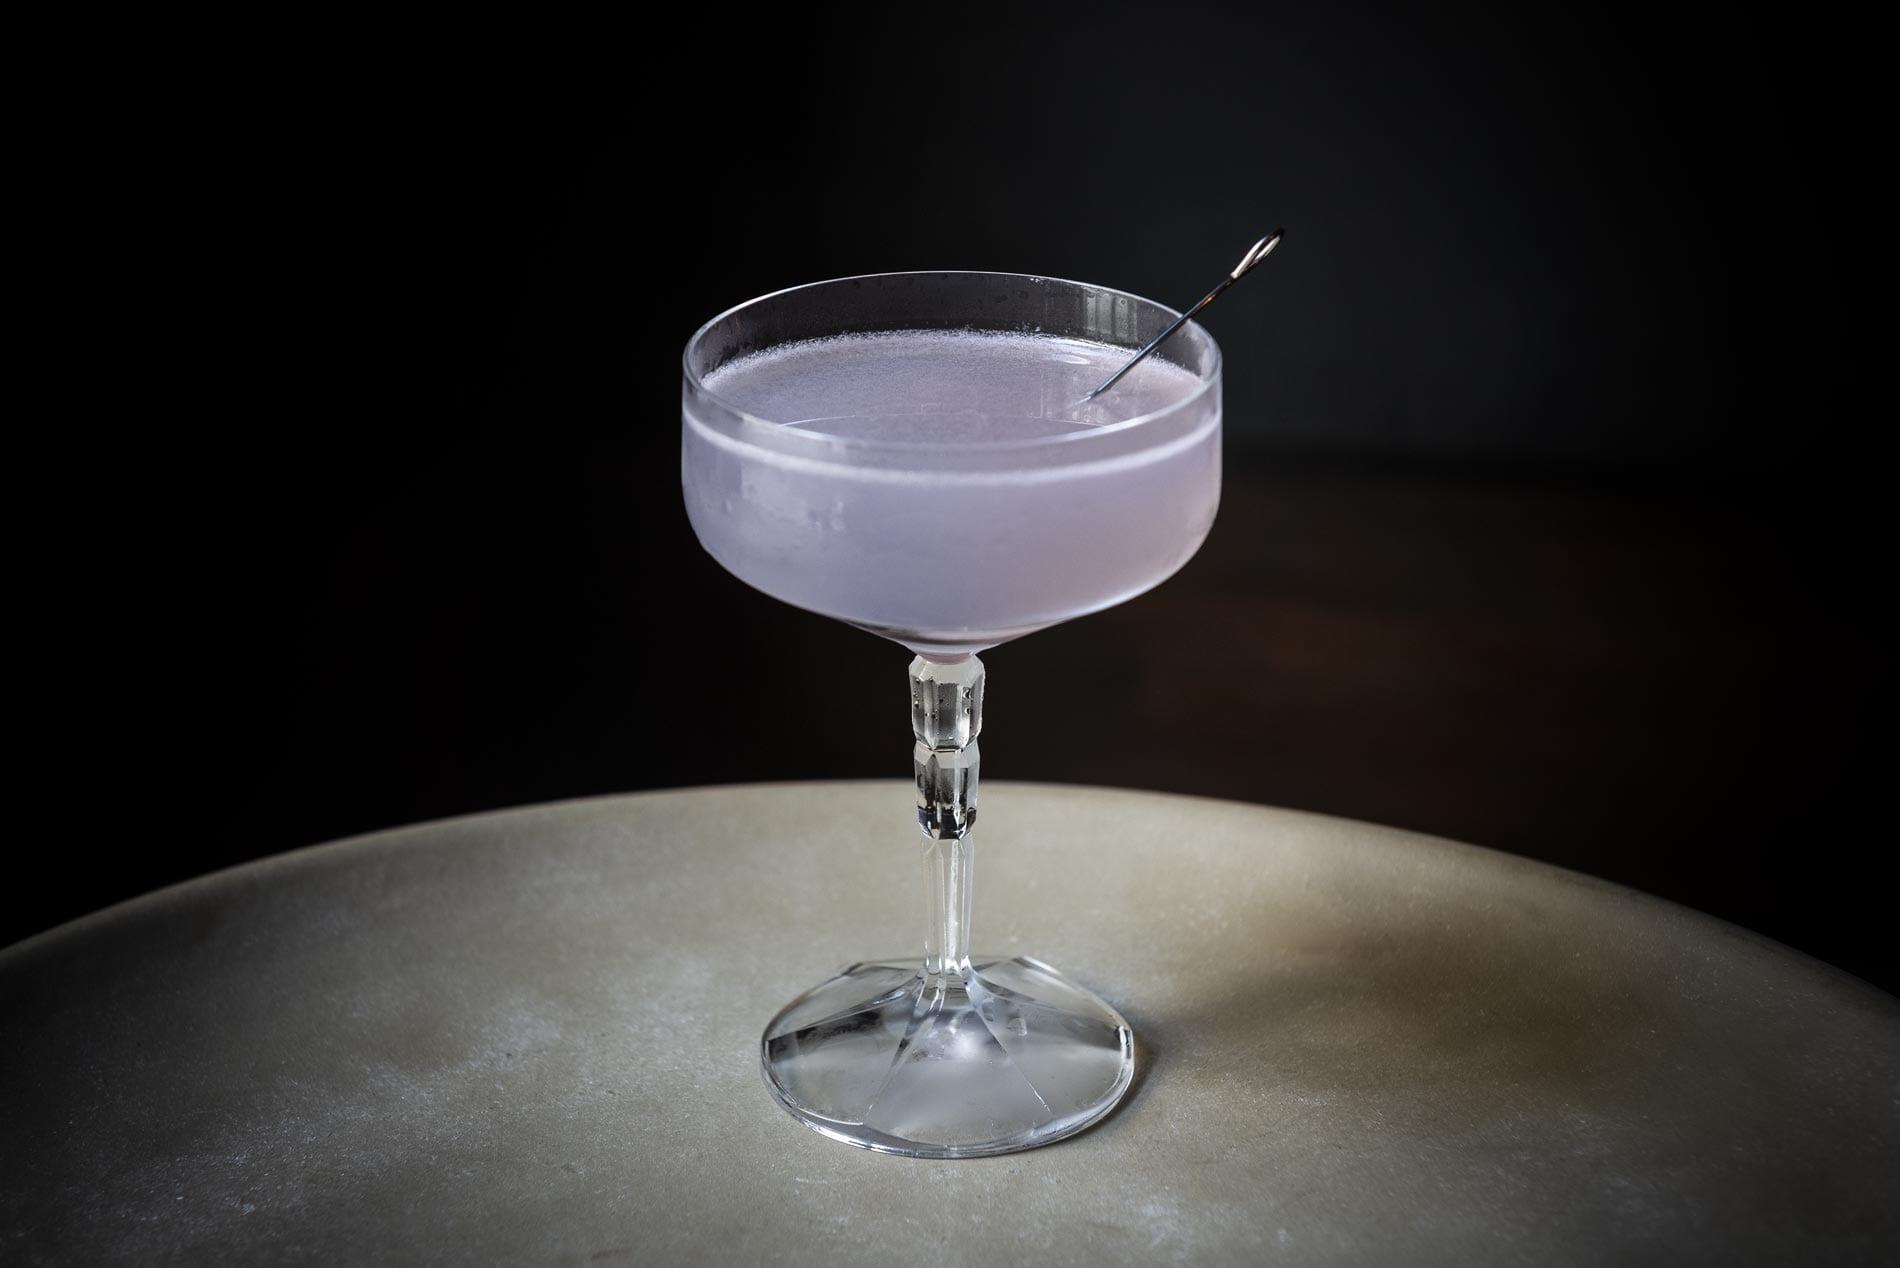 Aviation Cocktail Geschichte & Rezeptur